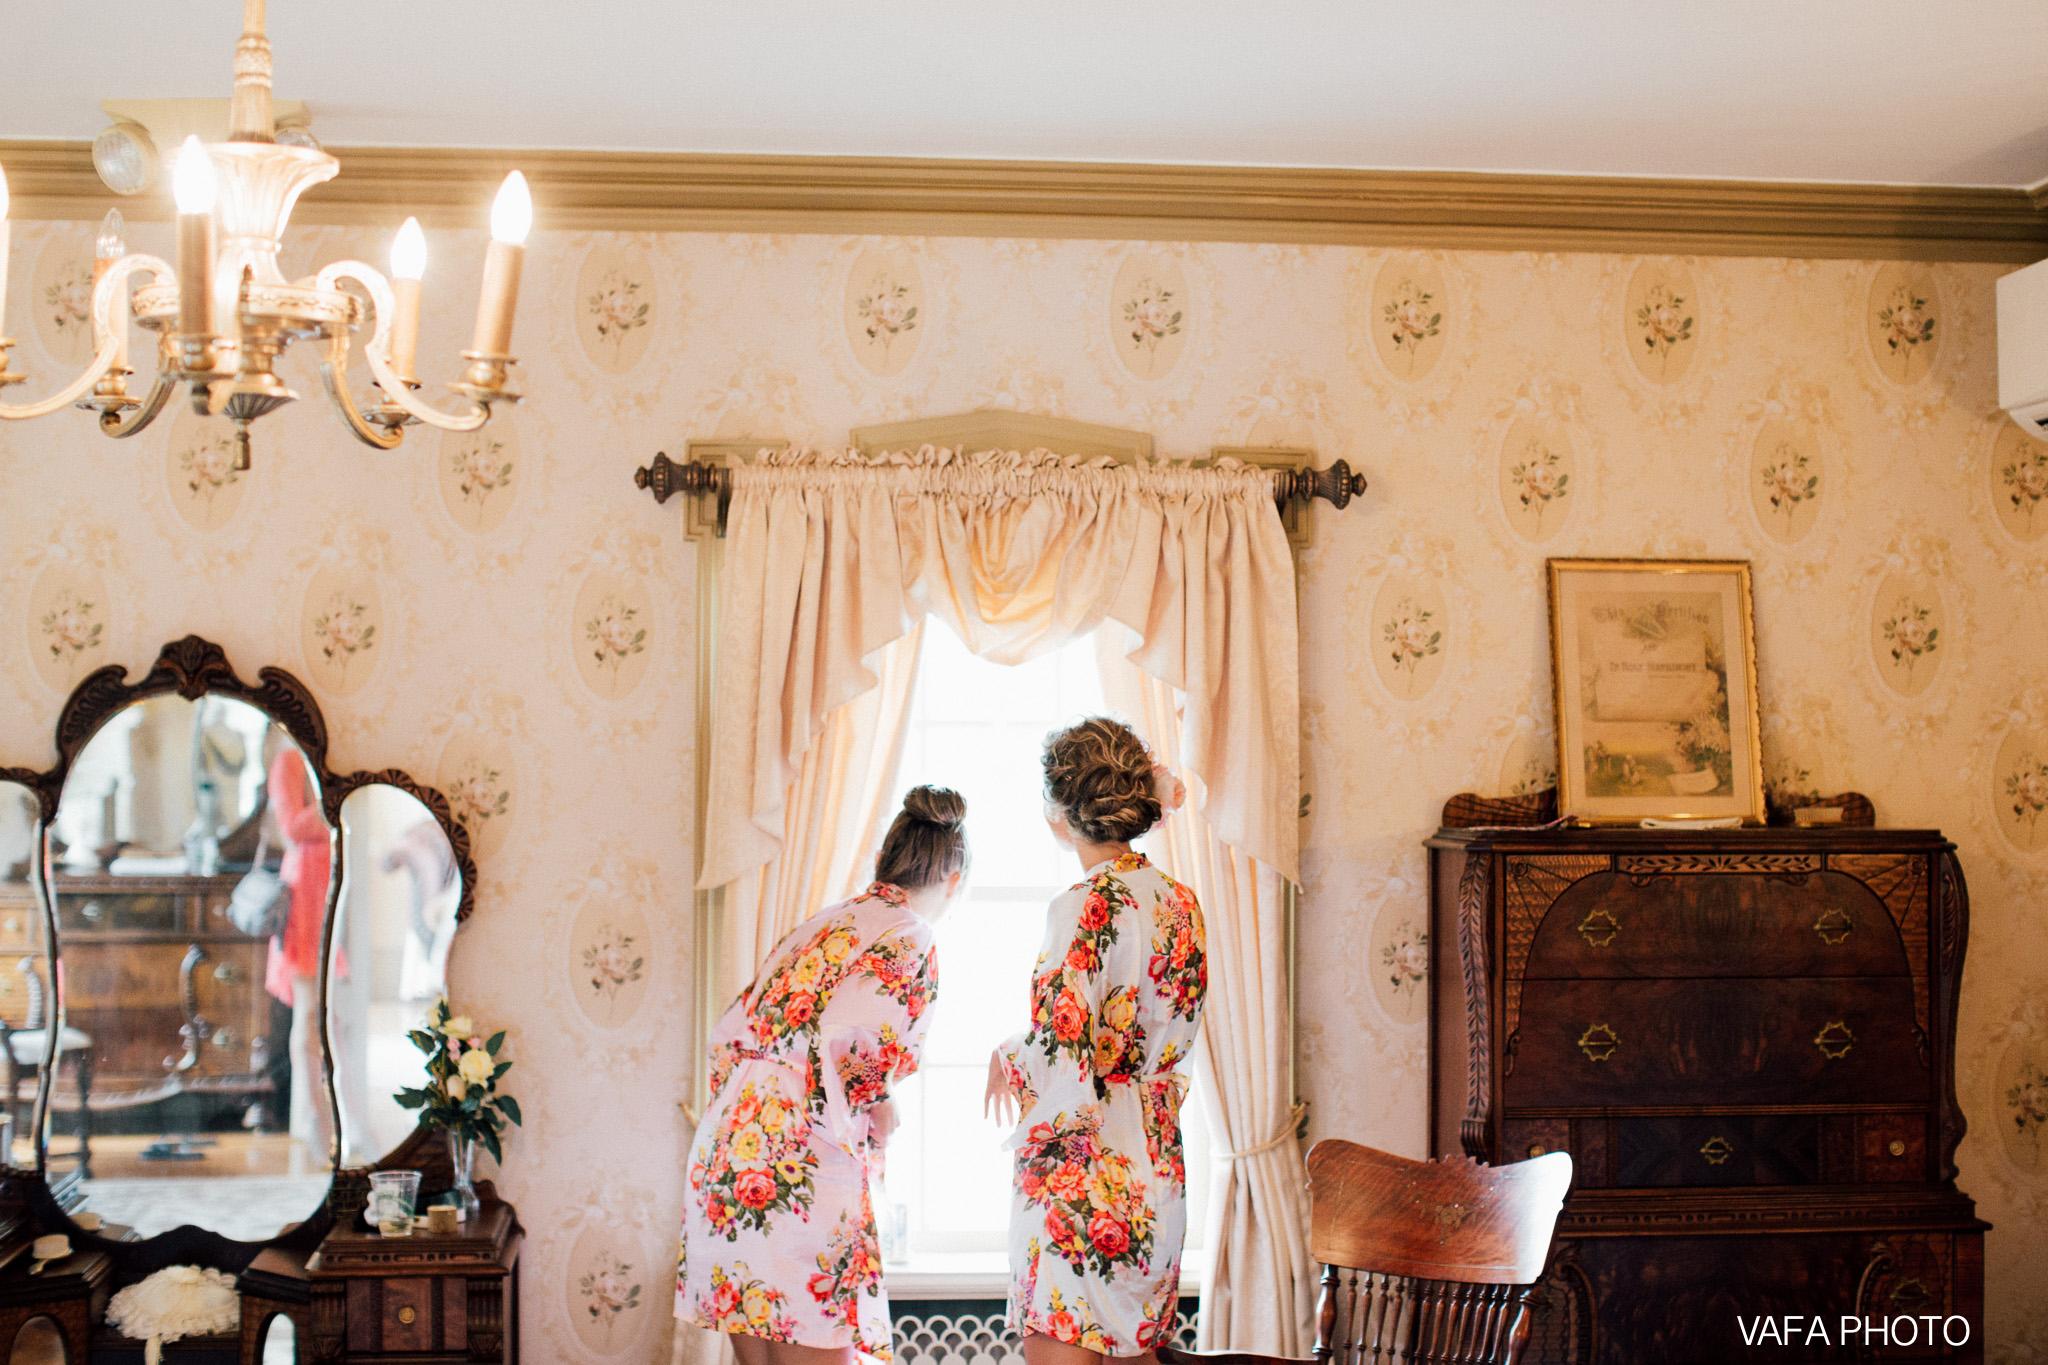 The-Felt-Estate-Wedding-Kailie-David-Vafa-Photo-120.jpg